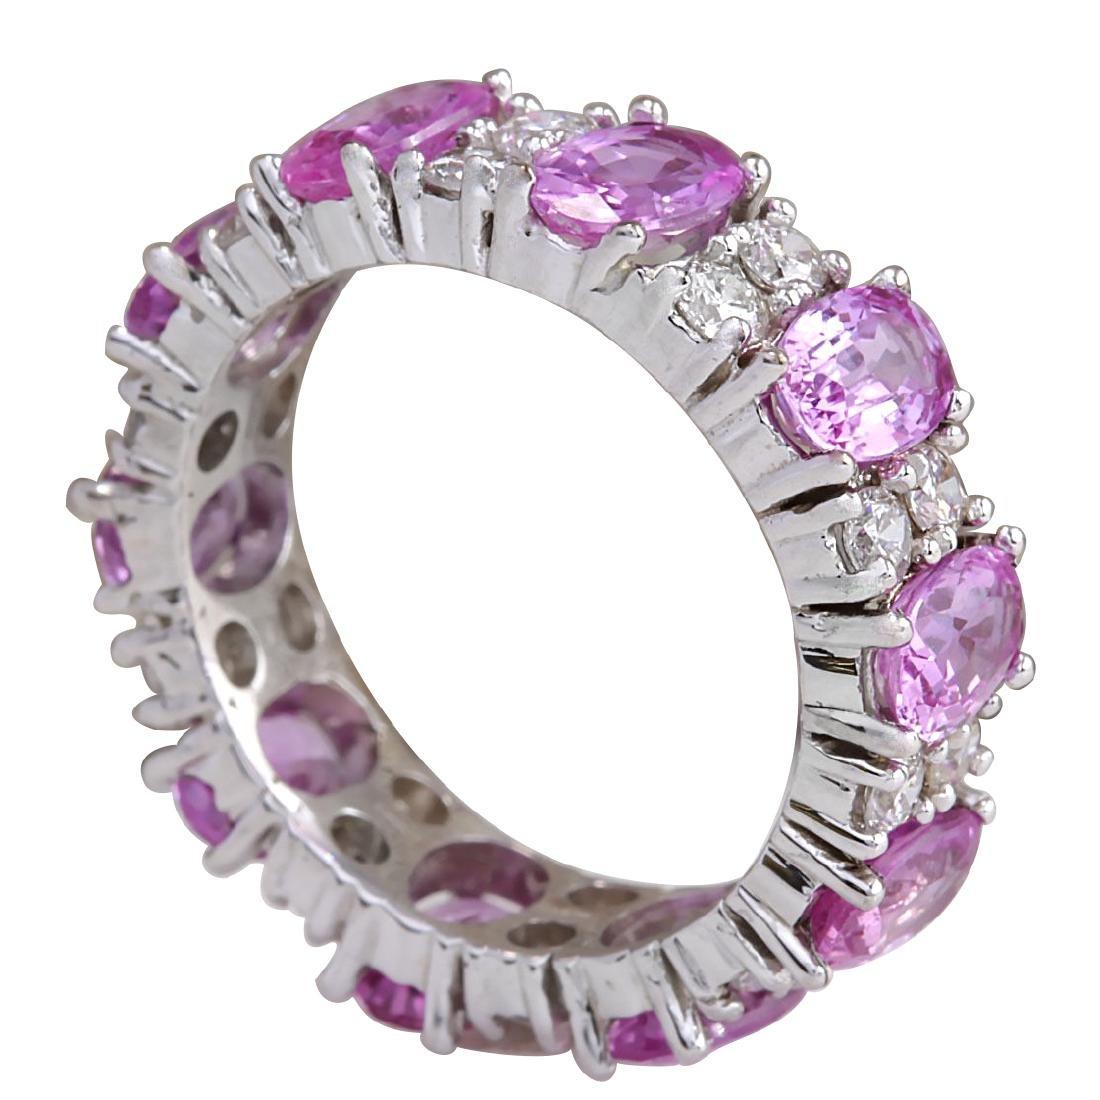 7.71CTW Natural Pink Ceylon Sapphire Diamond Ring 18K - 3